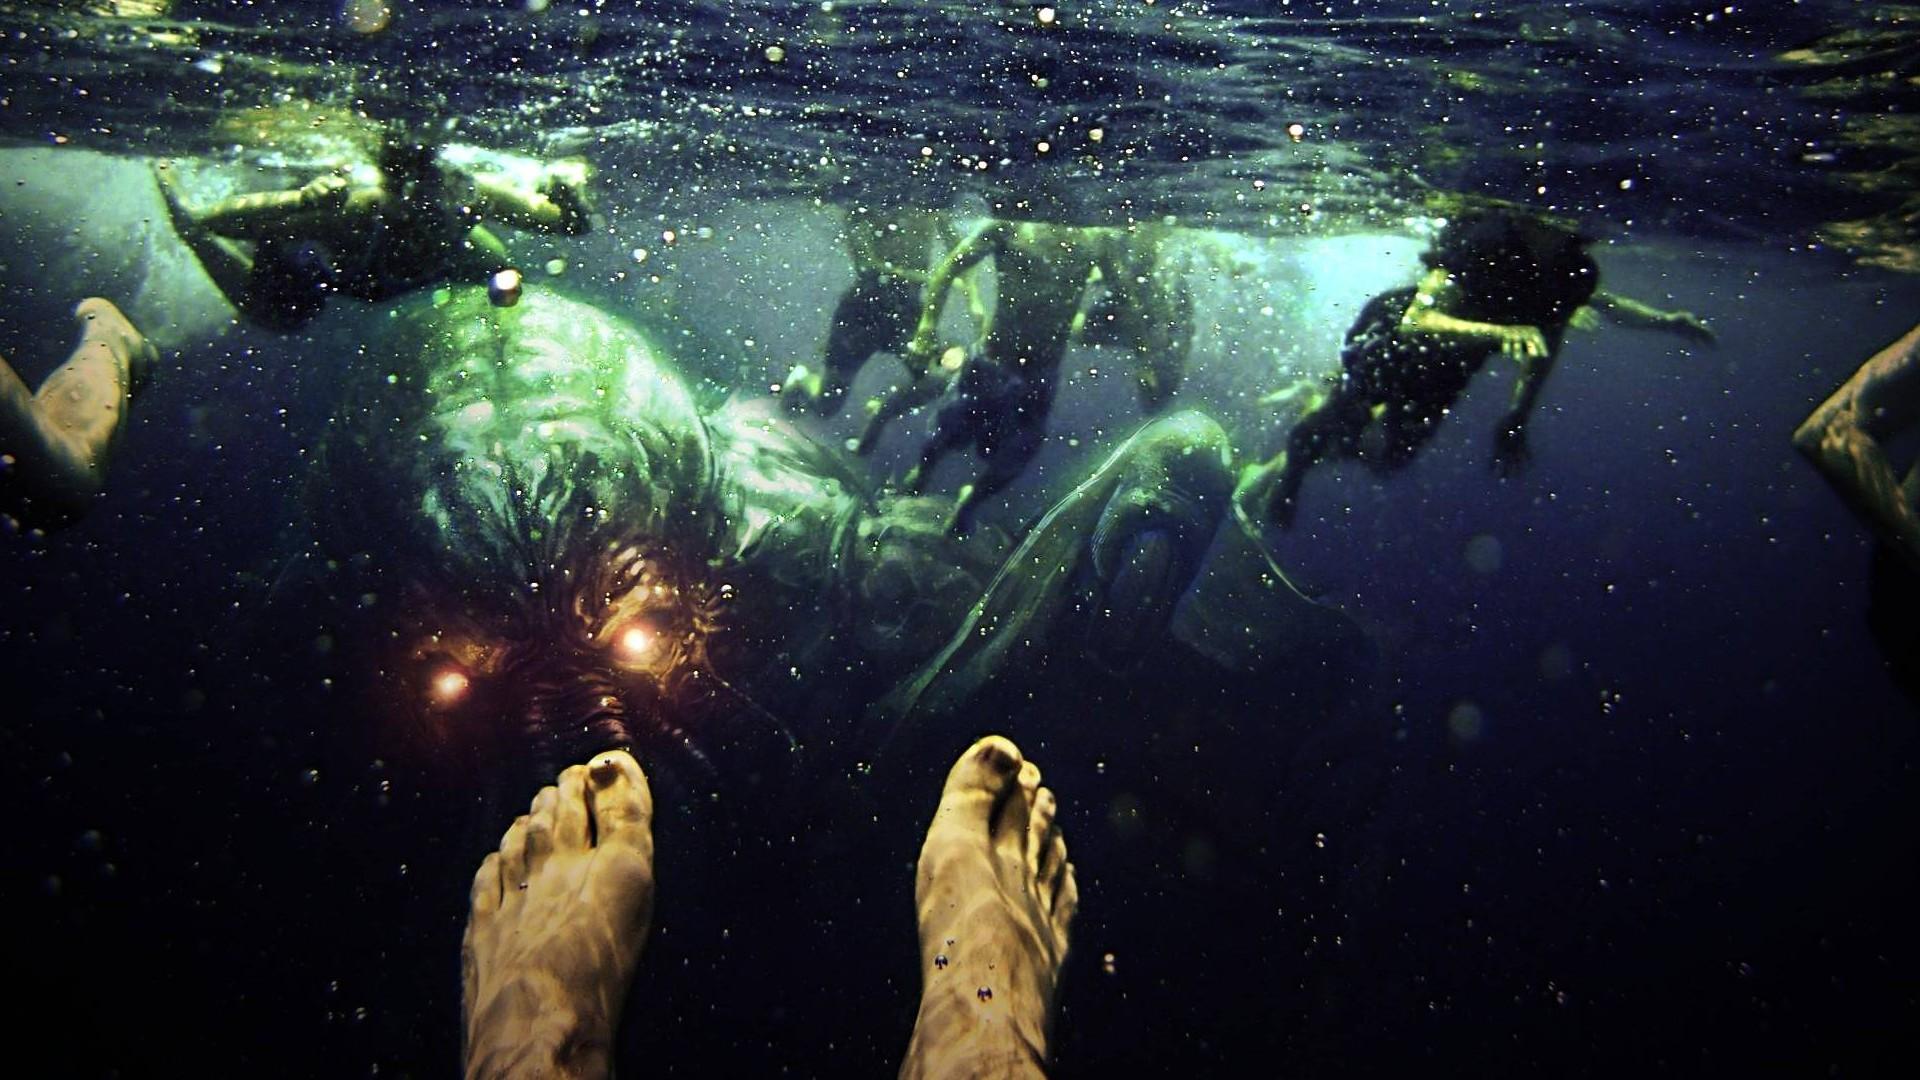 Wallpaper 1920x1080 Px Cthulhu Underwater 1920x1080